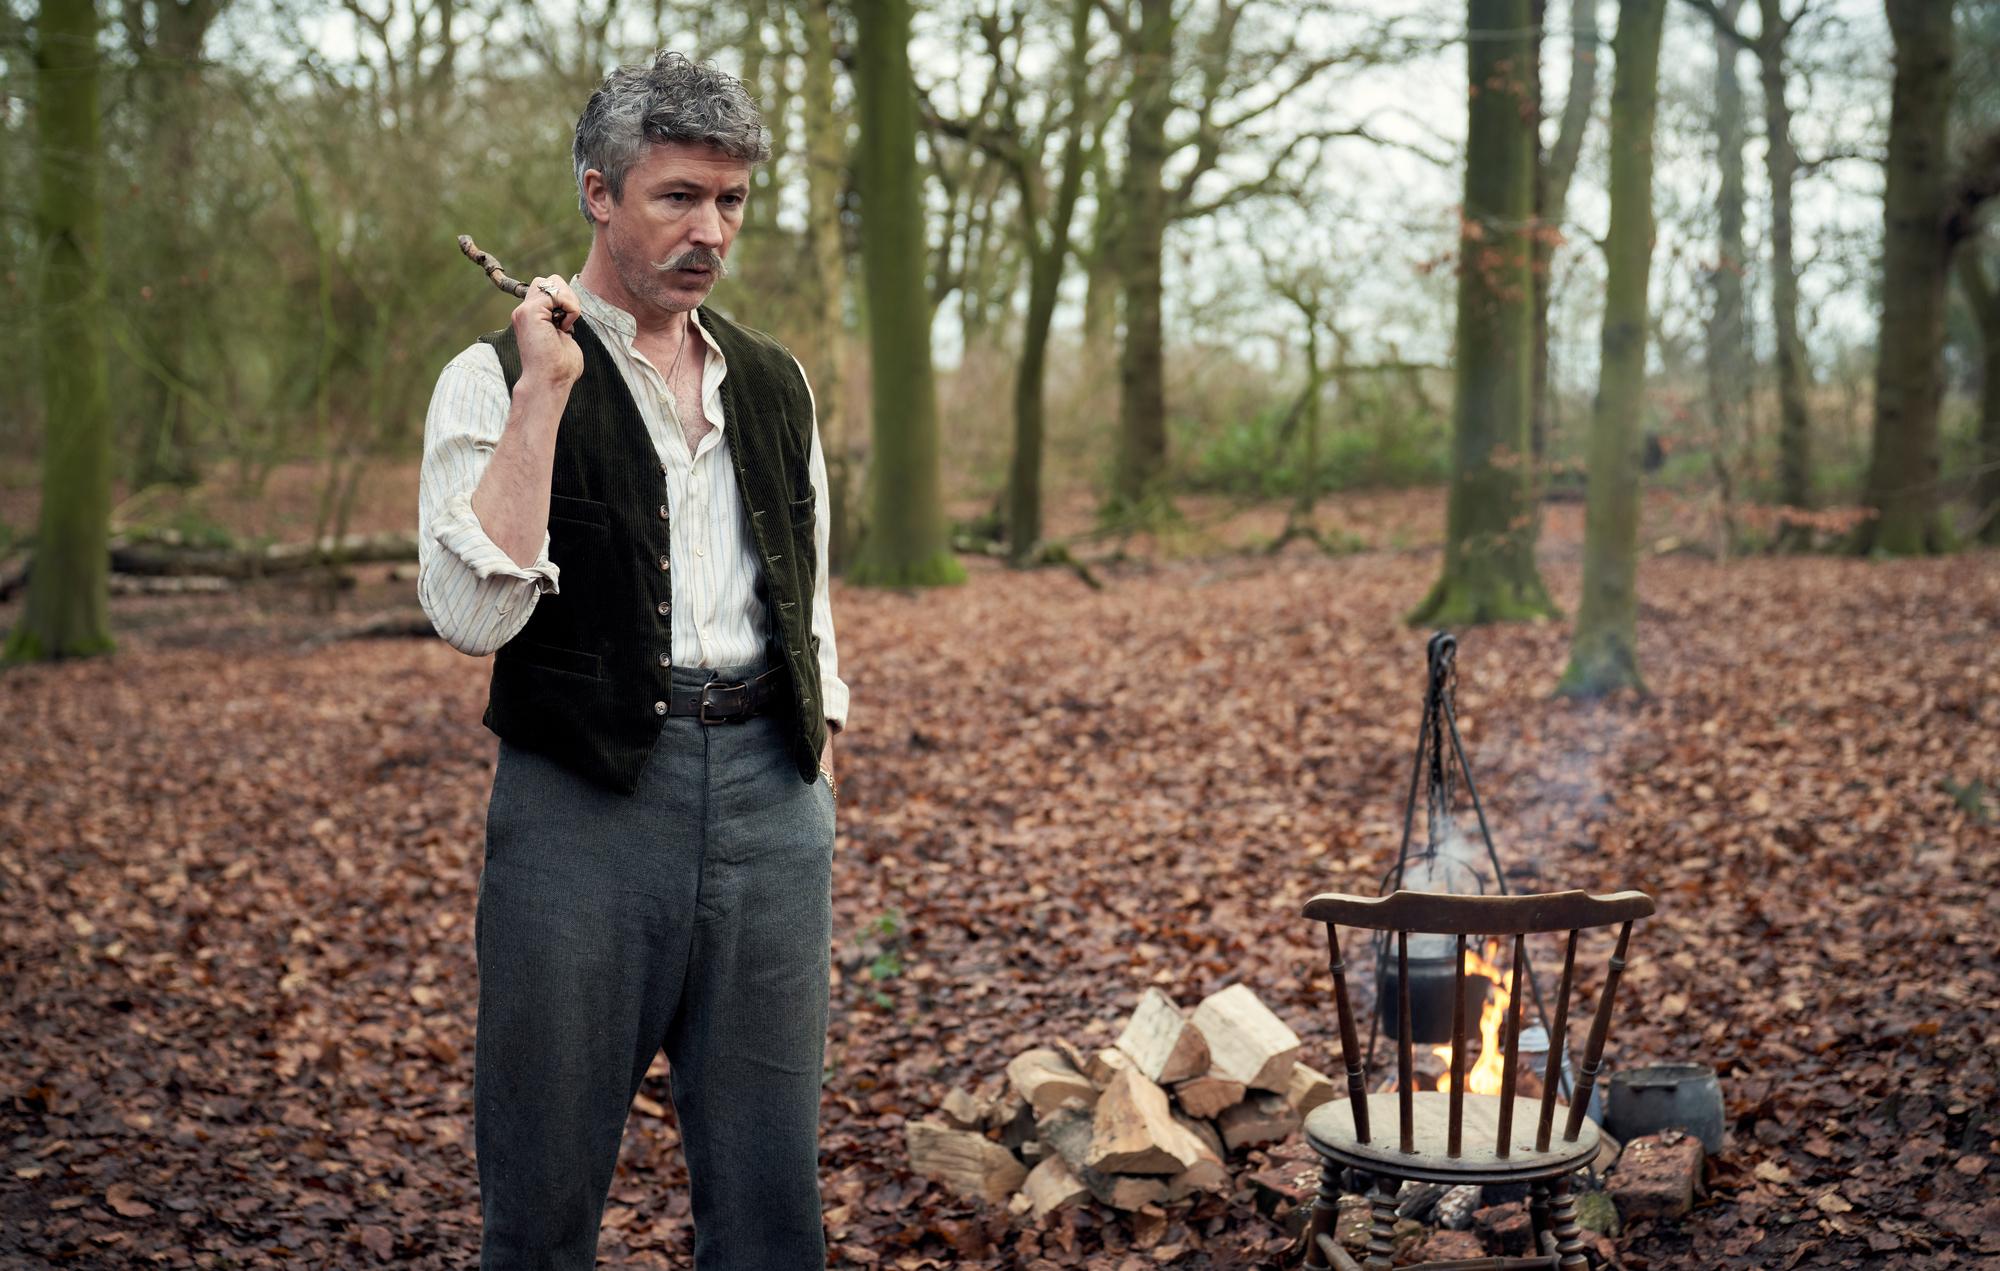 Peaky Blinders' Season 5 - release date, trailer, cast, plot